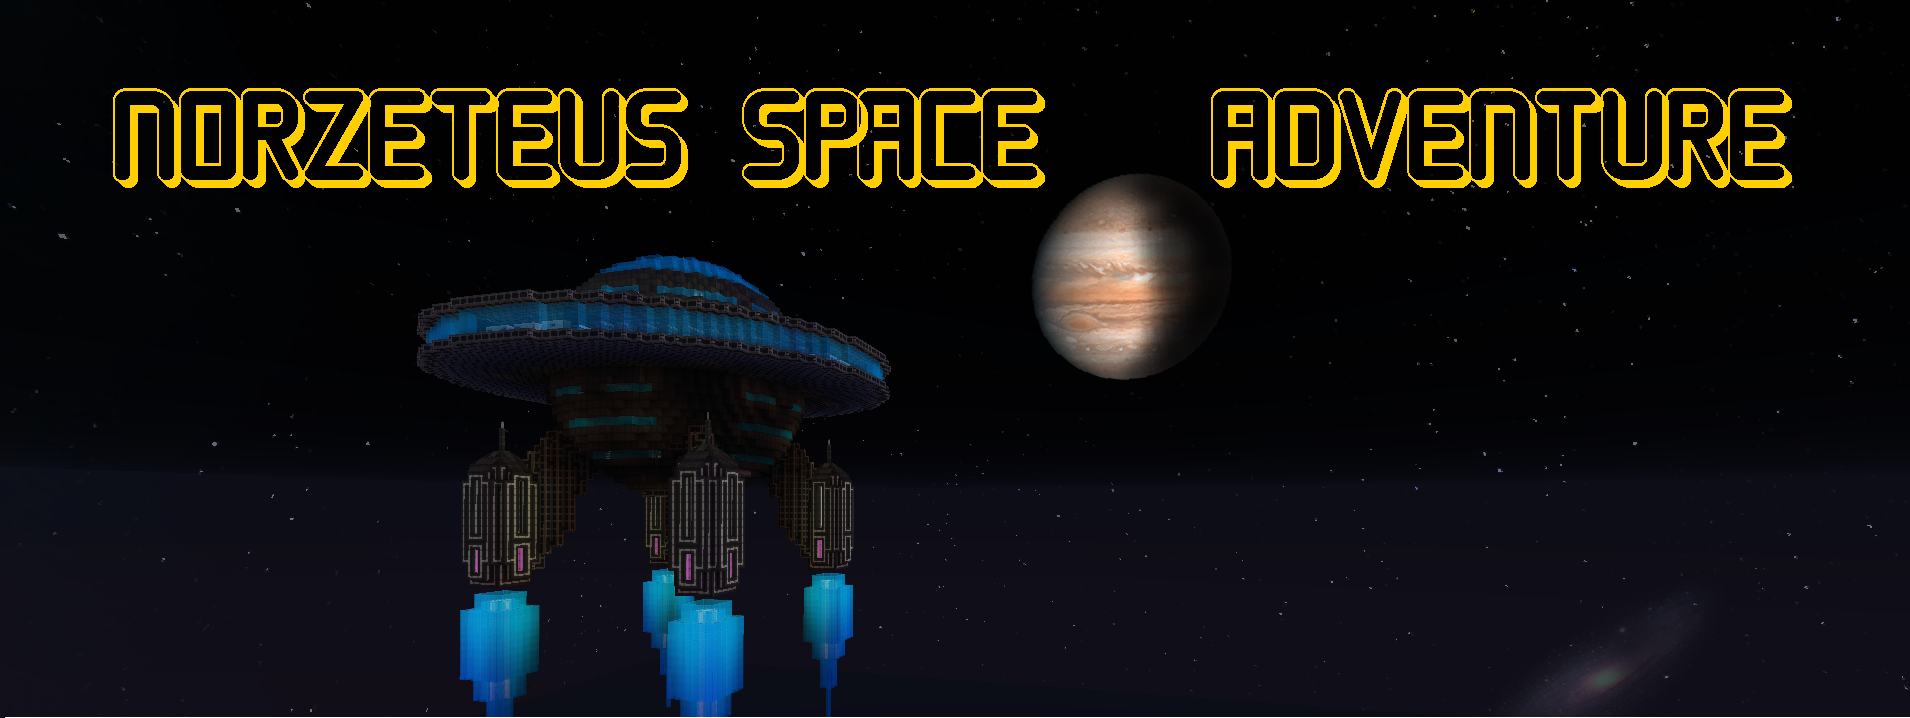 Norzeteus Space reduced скриншот 1